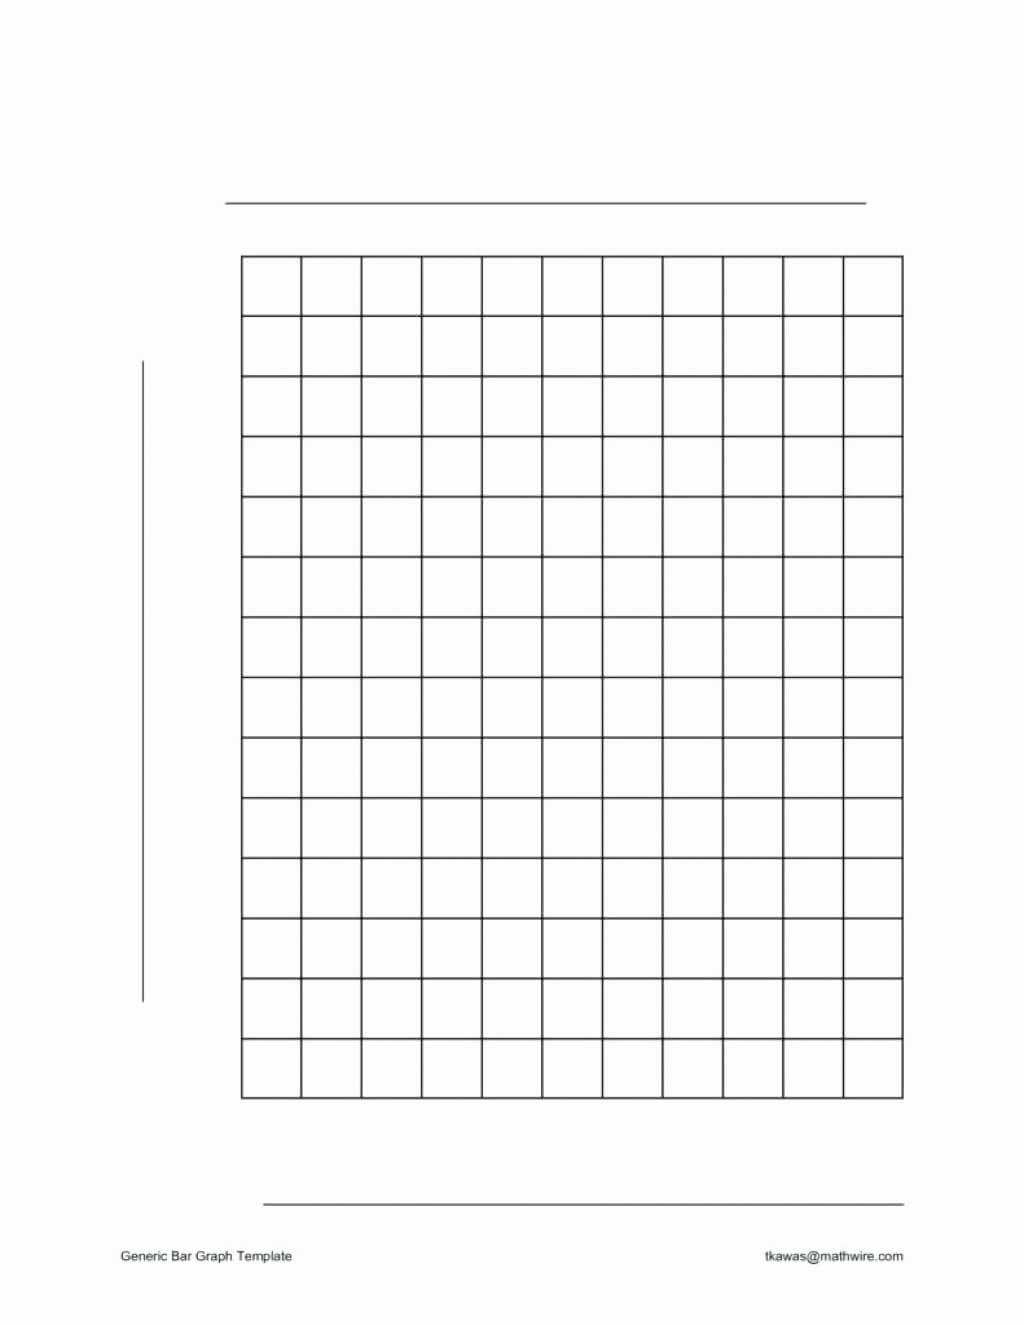 008 Bar Graph Template Blank Wondrous Ideas For Kindergarten Throughout Blank Picture Graph Template